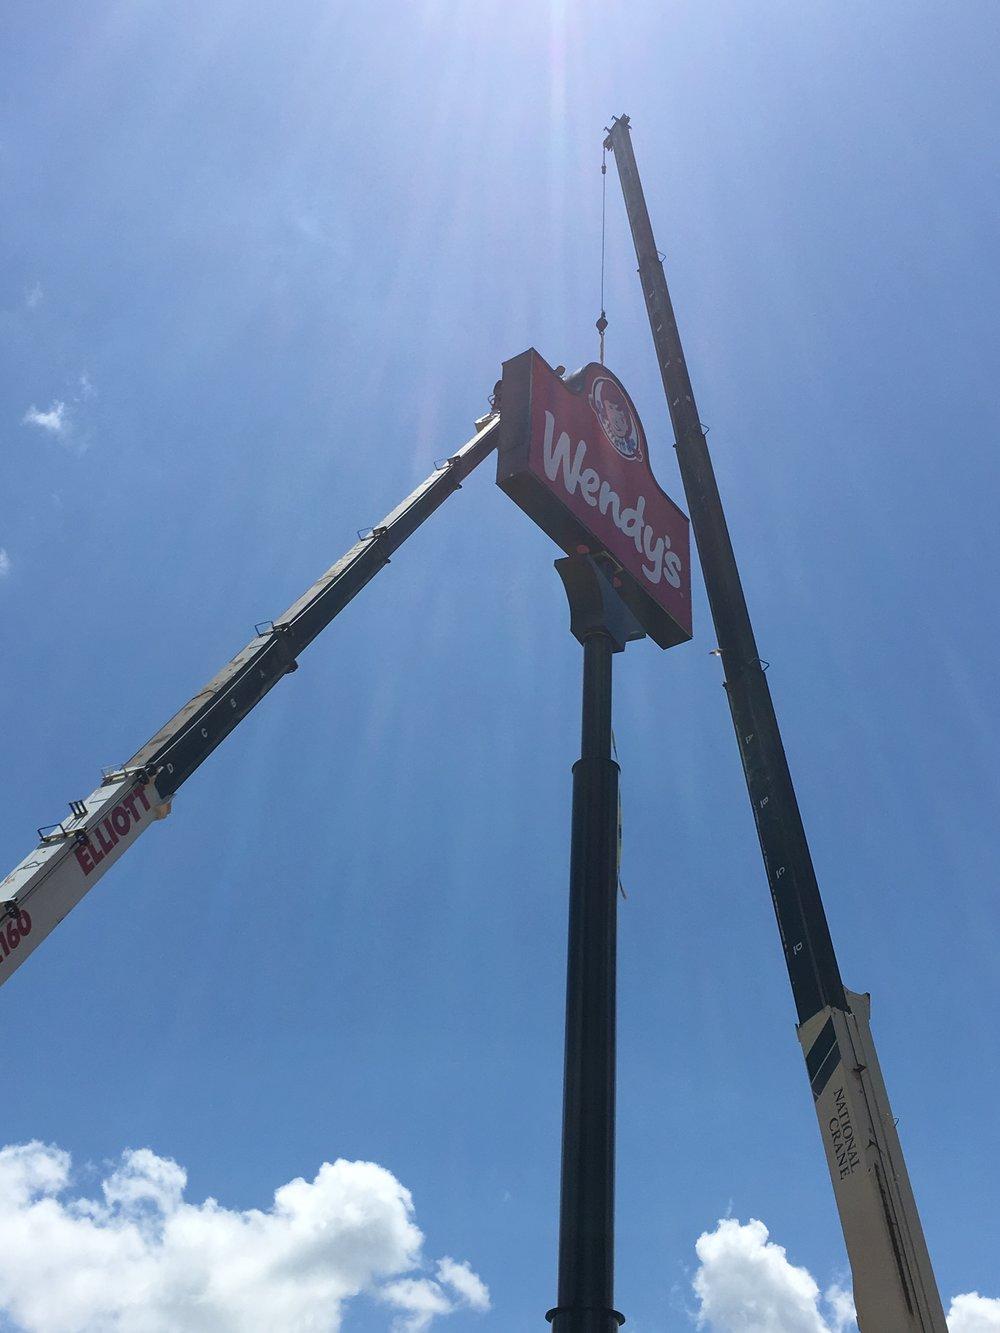 Carlisle Corporation_Wendy's-McComb Crossing_108 Doug Rushing Drive_McComb, MS   (60).JPG